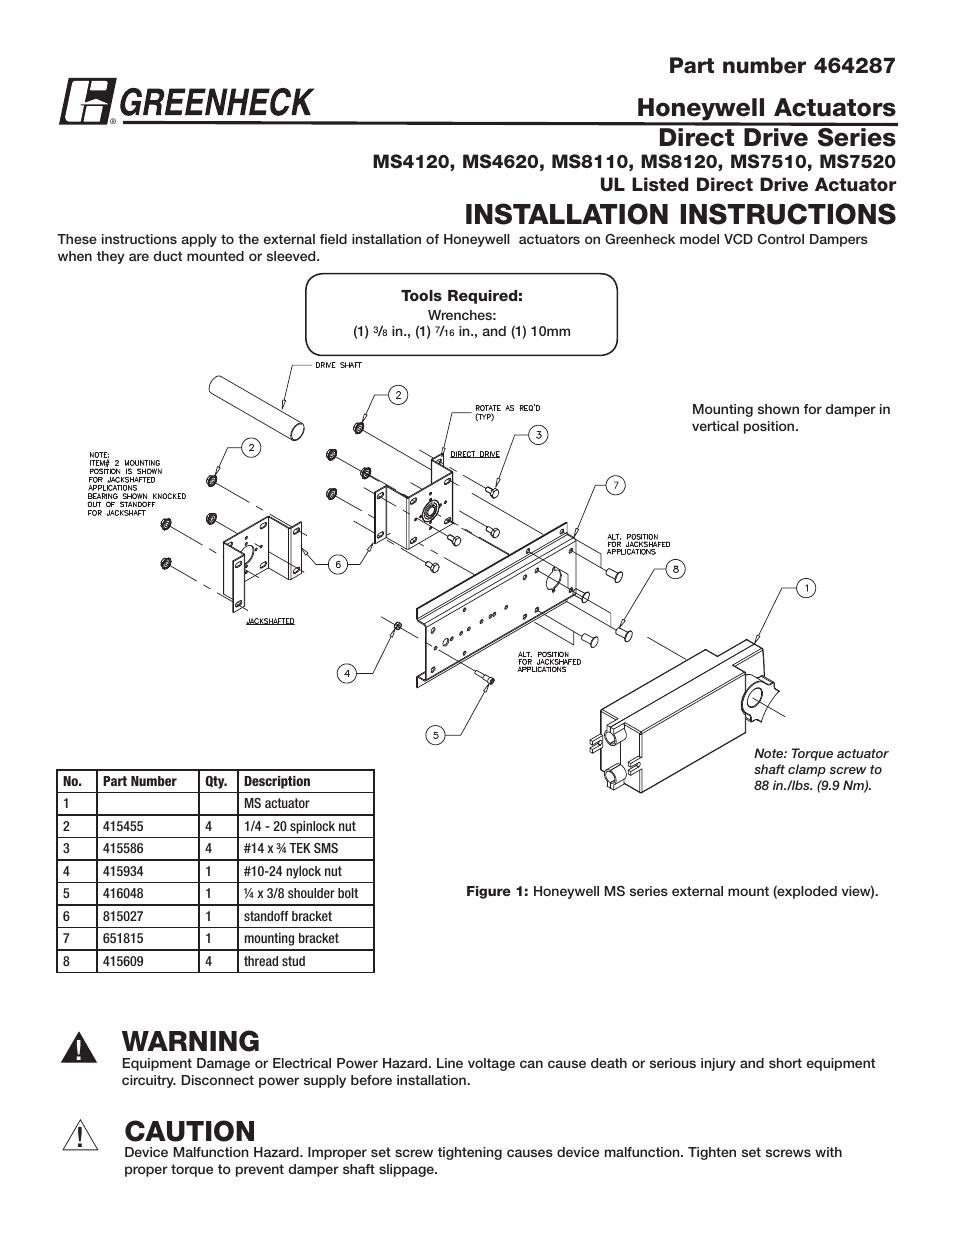 Greenheck Ms4120 Ms4620 Ms8120 Ms7520 Series 464287 User Manual. Greenheck Ms4120 Ms4620 Ms8120 Ms7520 Series 464287 User Manual 2 Pages. Wiring. Honeywell Ms7520 Actuator Wiring Diagram At Scoala.co